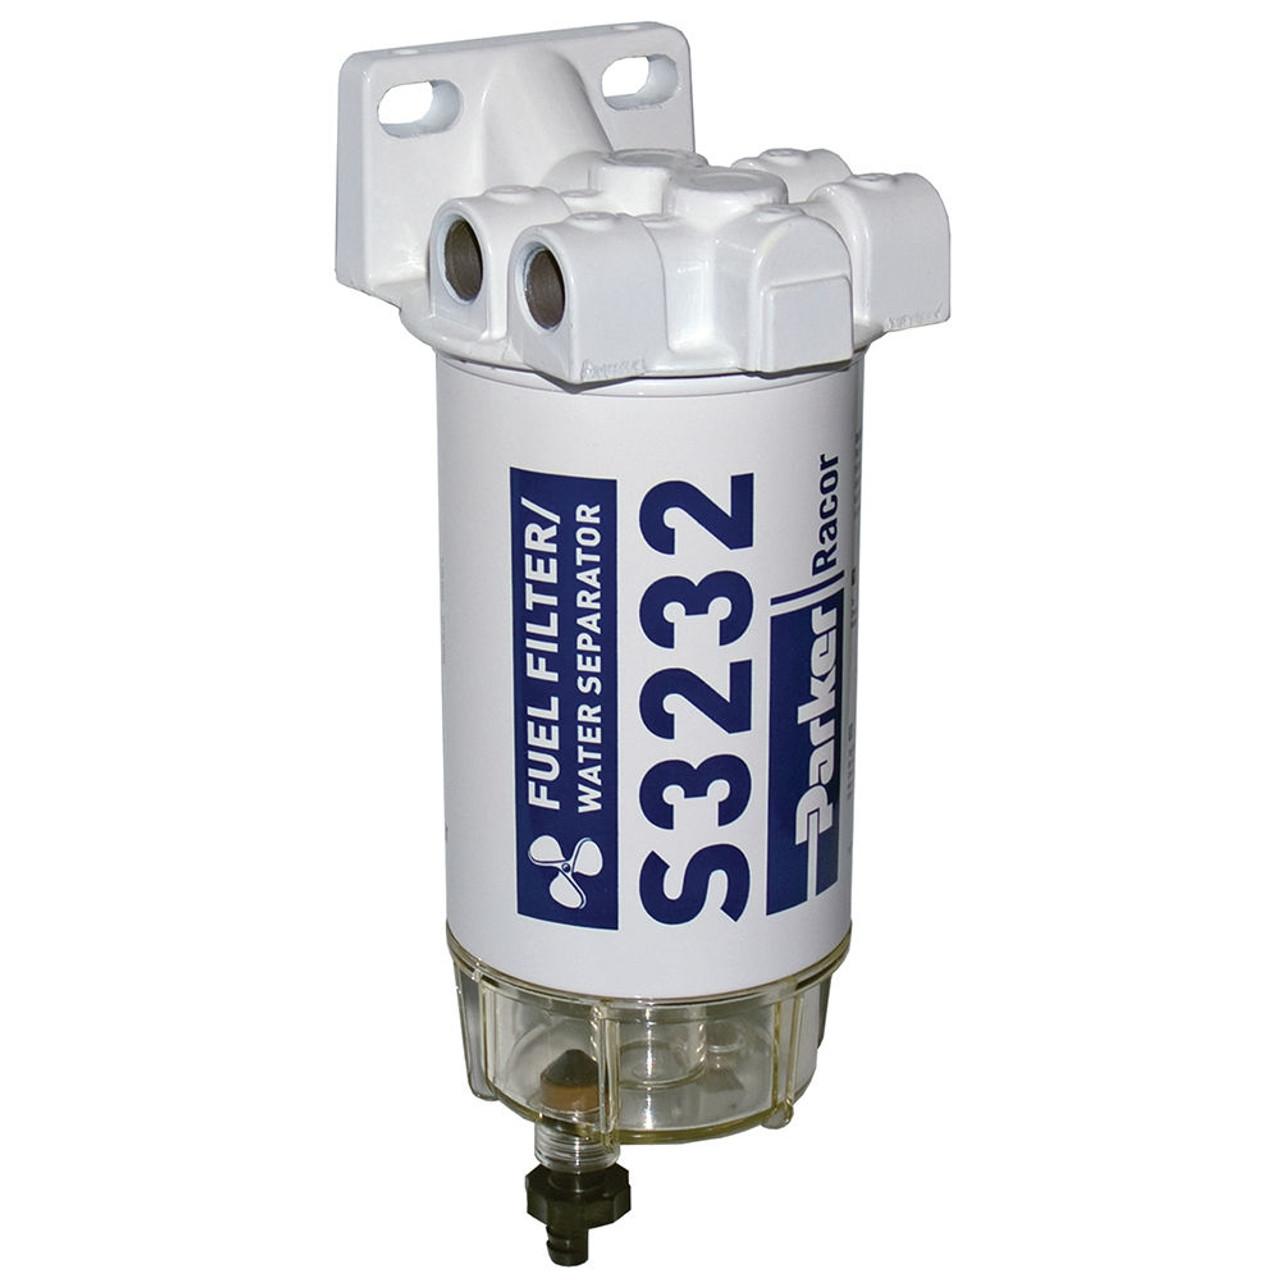 racor aquabloc marine 3 8 in 90 gph spin on gasoline filter Racor Marine Gas Filter racor aquabloc marine 3 8 in 90 gph spin on gasoline filter assembly s3232 6 qty john m ellsworth co inc